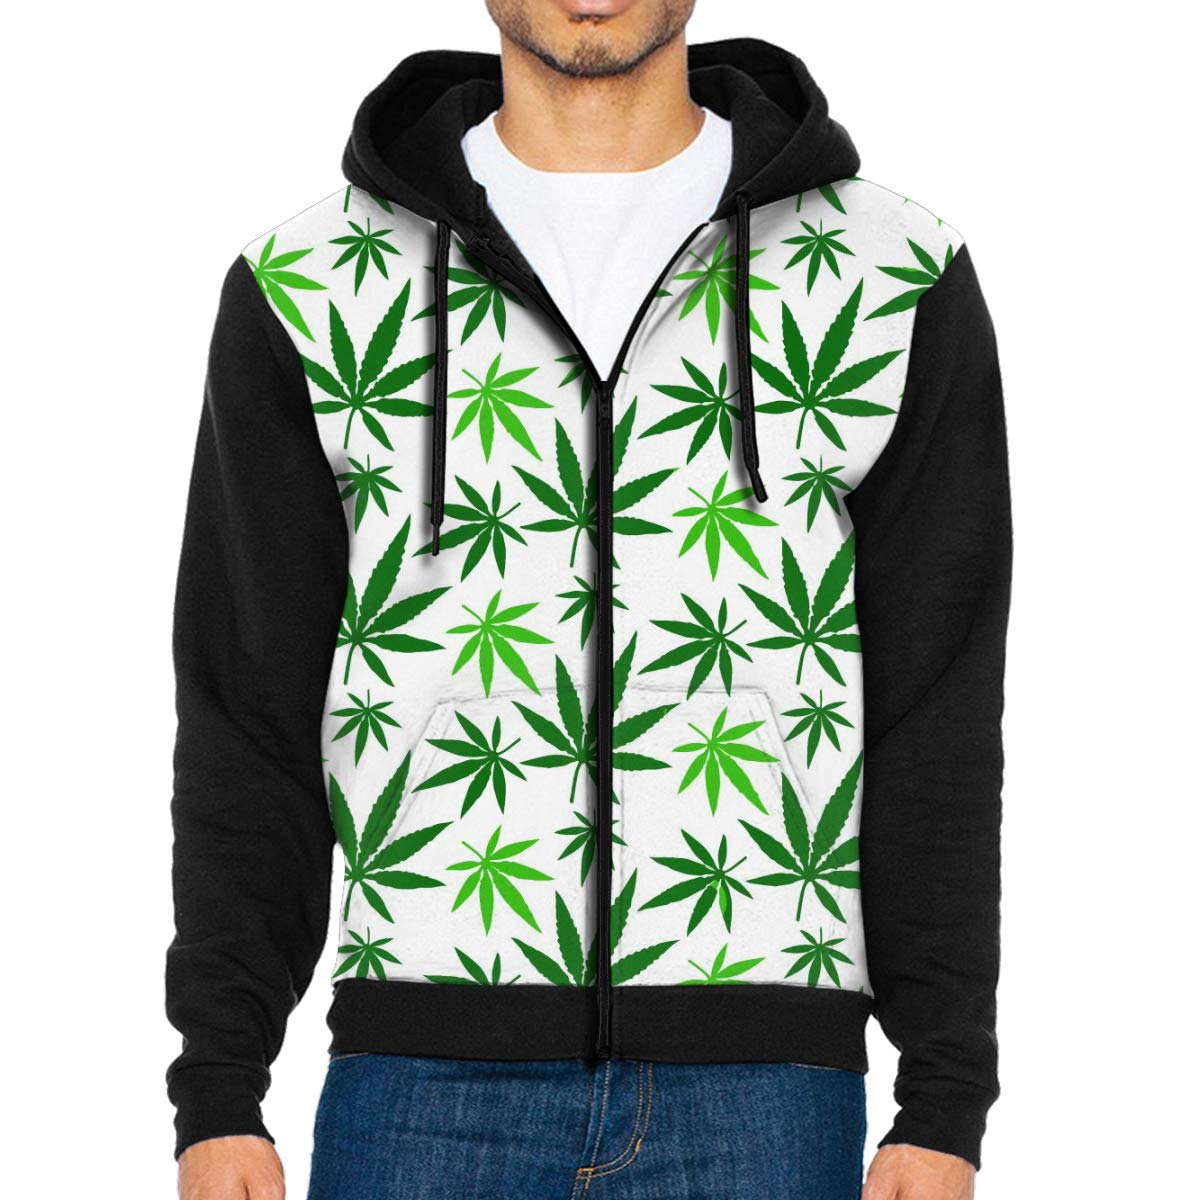 G-Fulling Cannabis Hemp Leaf Pattern 3D Print Fashion Men's Hooded Sweatshirts Drawstring Pullover Hoodies Pockets